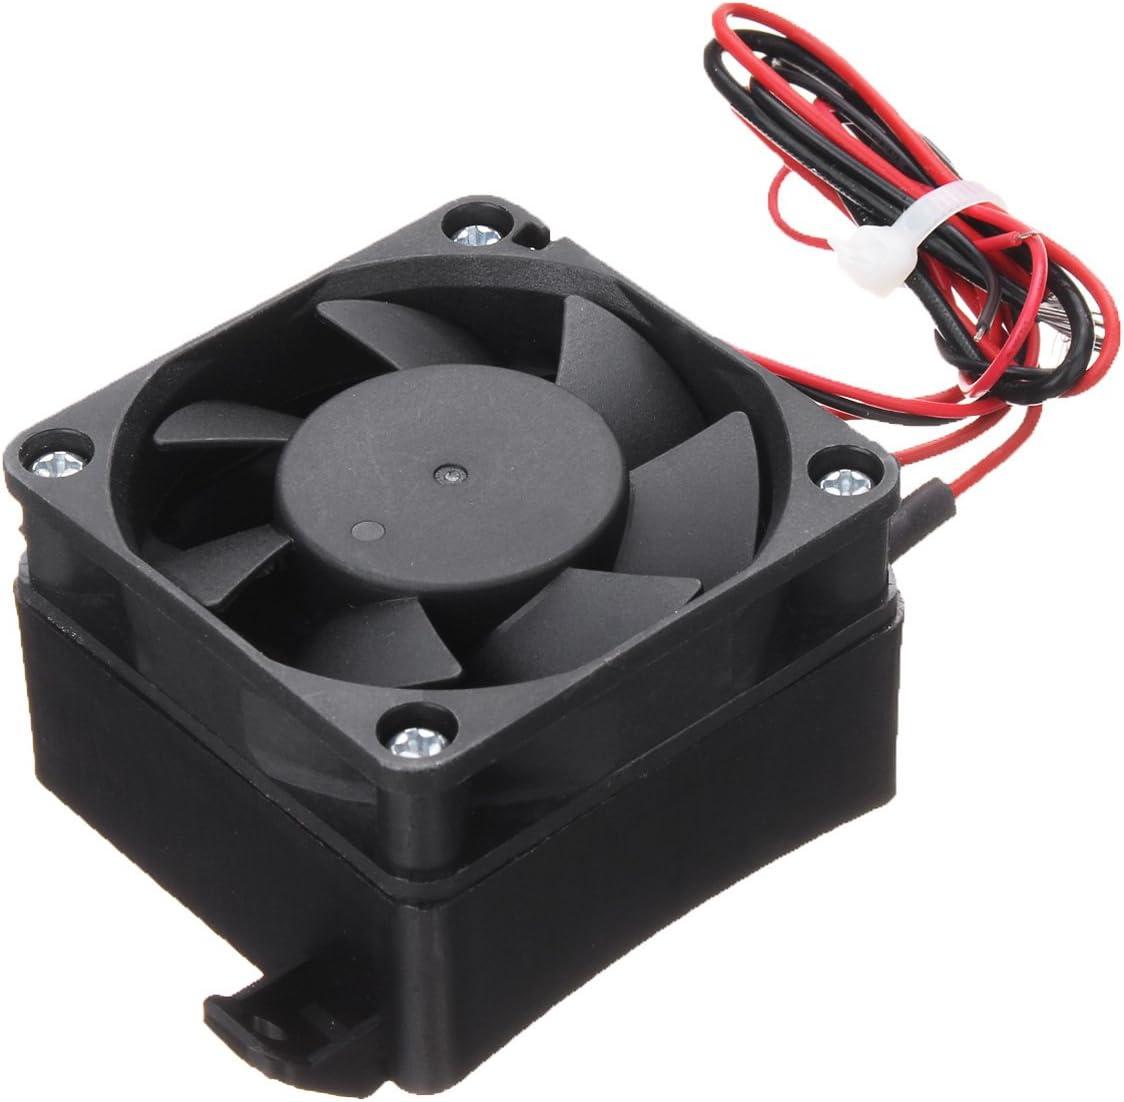 Calentador de aire de 24 V 150 W PTC para coches, temperatura constante